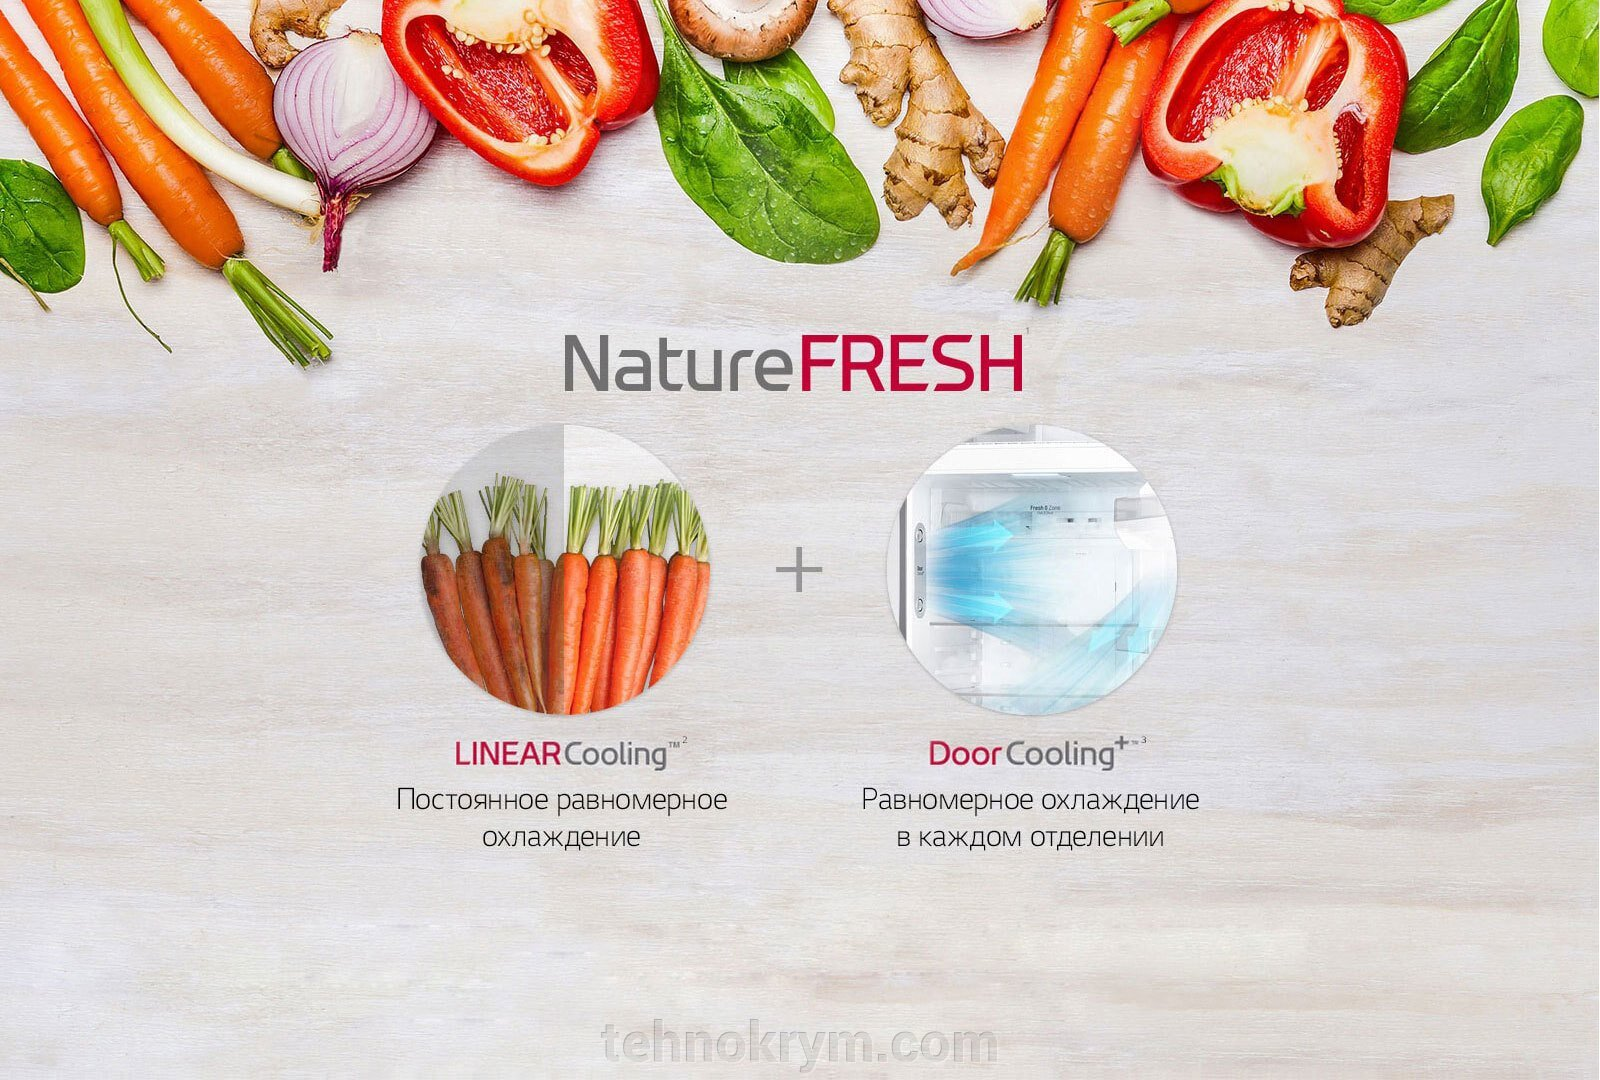 Двухкамерный холодильник LG GC-H502HEHZ, бежевый - фото pic_c80b00b317cb4d8ca330c96e760a542e_1920x9000_1.jpg